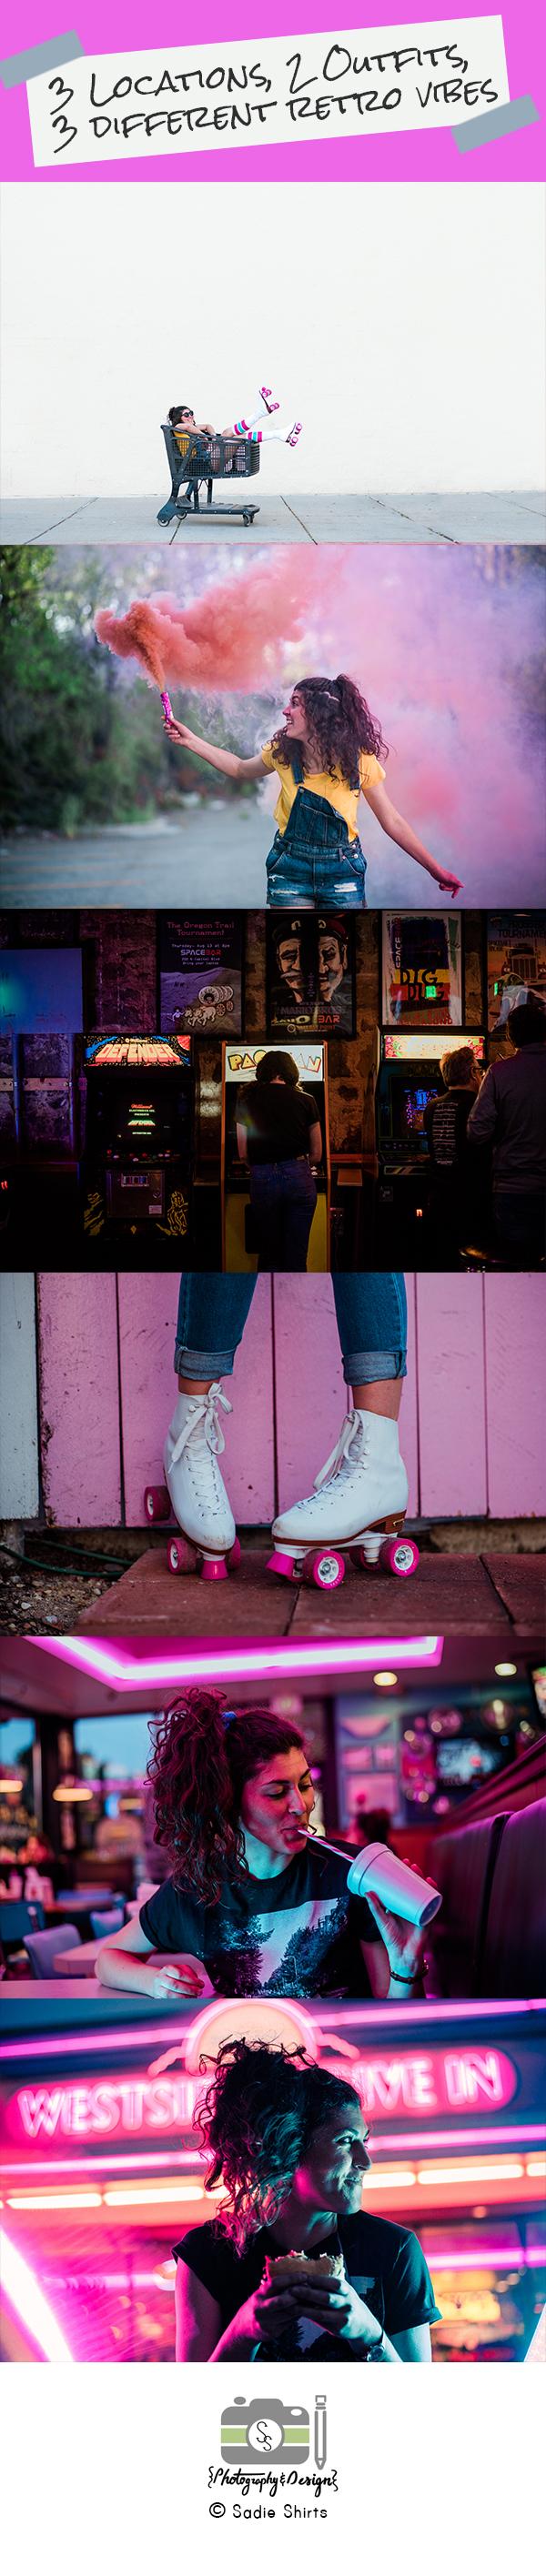 Retro // 80's // Beatles // Target Style // Vintage Styled Shoot // burgers // retro outfit // smoke bomb photography // rollerskate photography // arcade photoshoot // Boise Wedding Photographer // Idaho // Idaho Session // Styled Shoot Ideas // Outfit Ideas // Overall outfit // Spacebar Boise // cheeseburger // milkshake // neon lighting // neon photoshoot // SS Photography & Design // Sadie Shirts